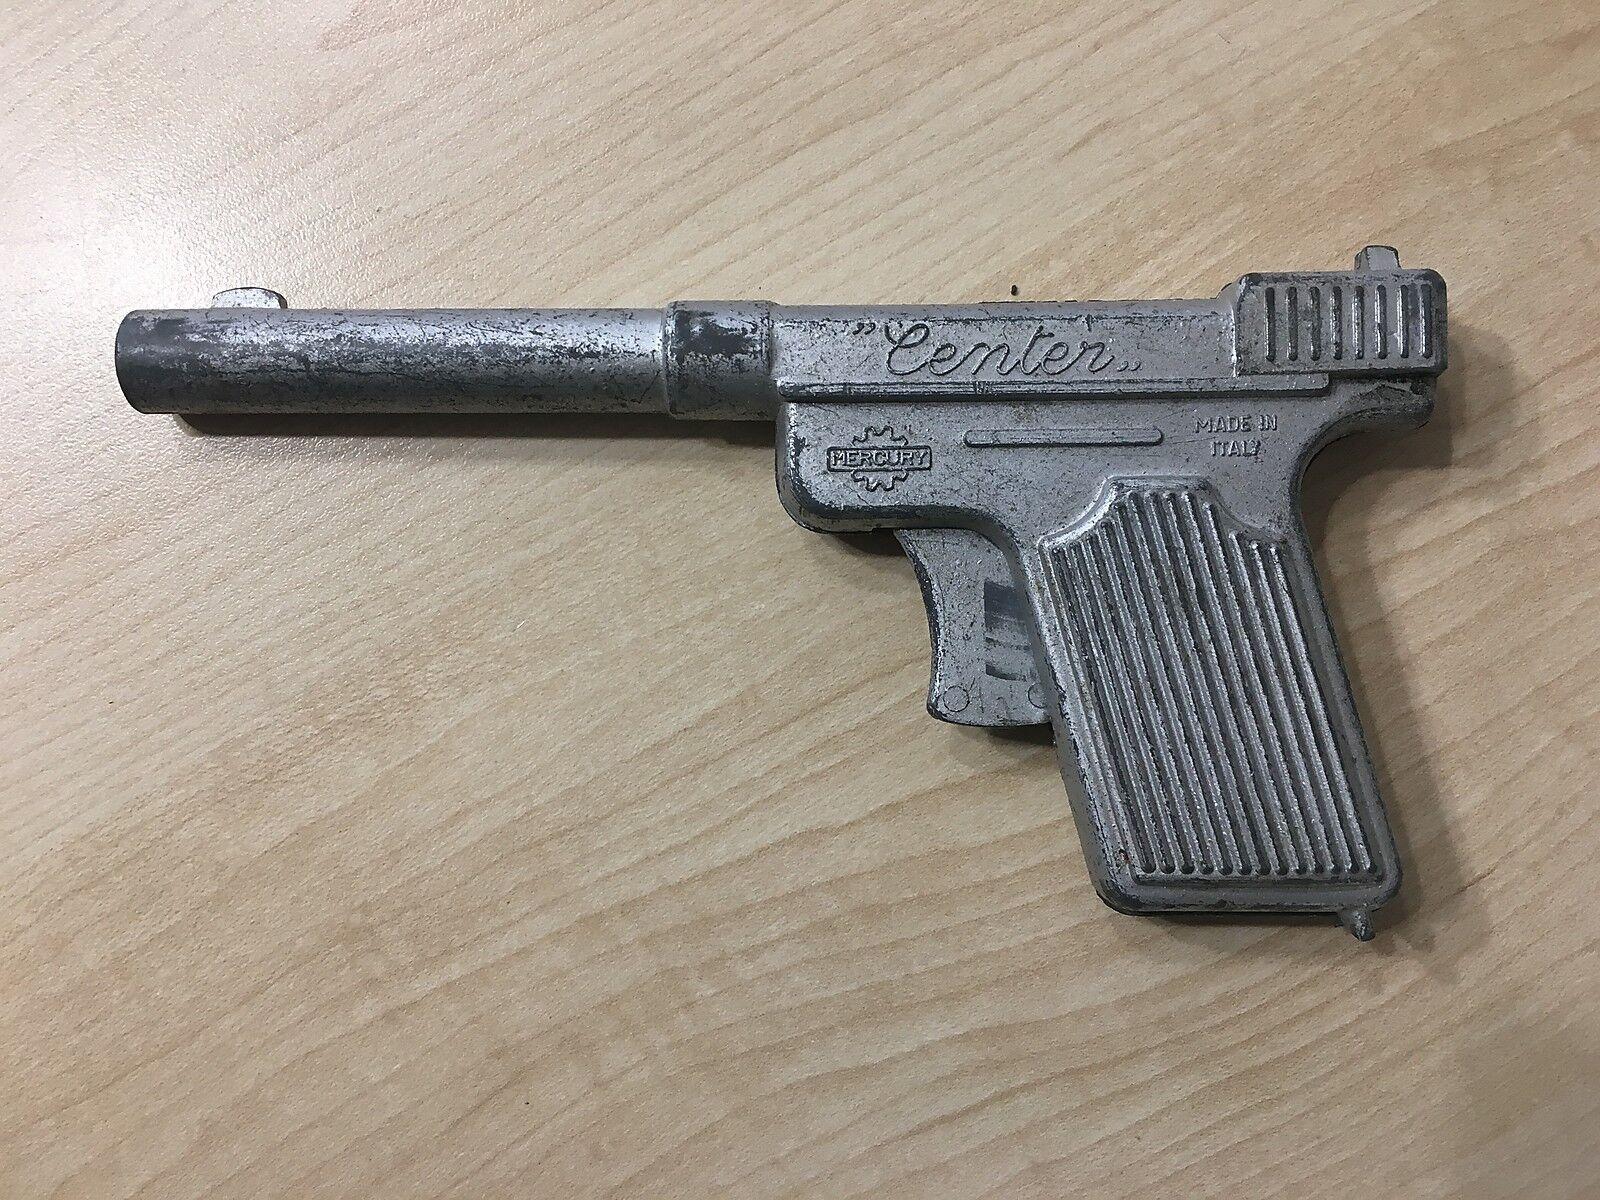 71754 Pistola giocattolo vintage - Center Mercury art. 102